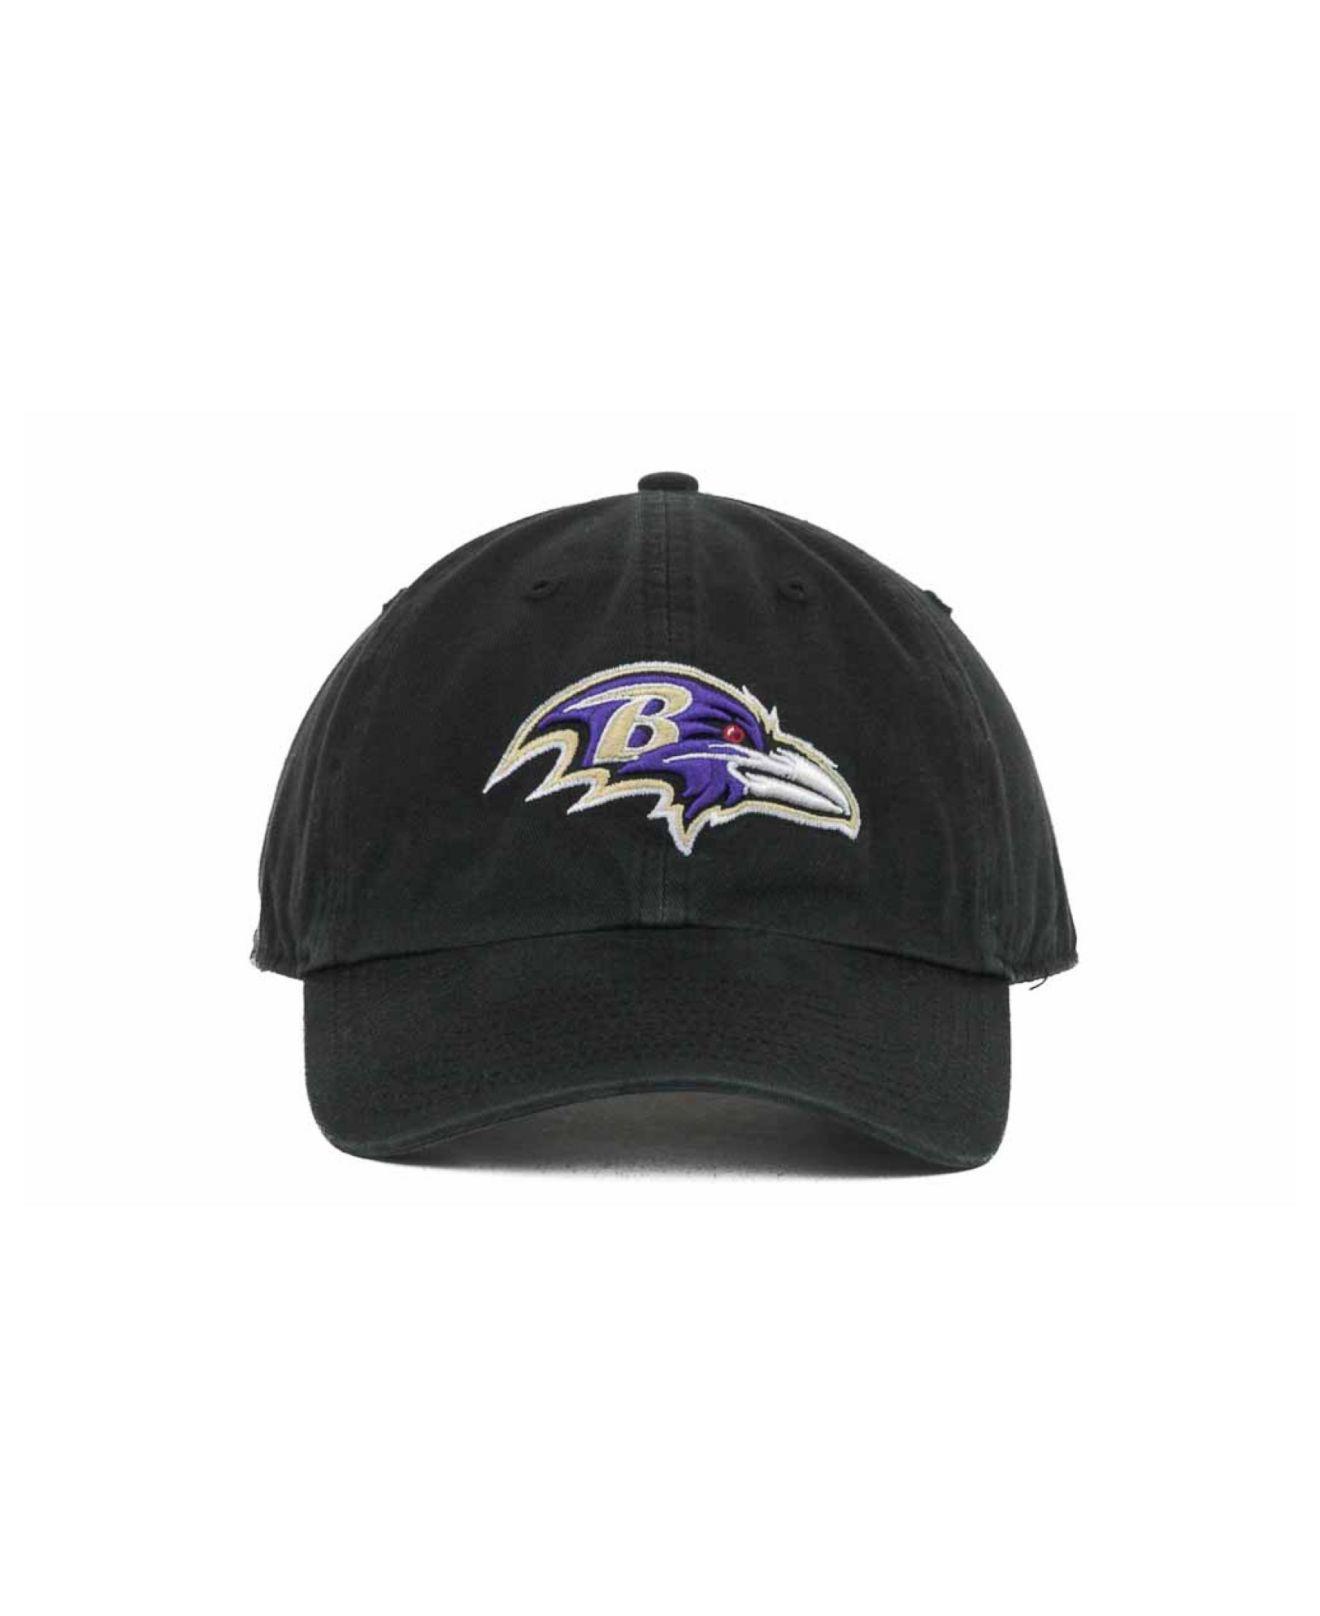 Lyst - 47 Brand Baltimore Ravens Clean Up Cap in Black for Men f5ffa3fe2